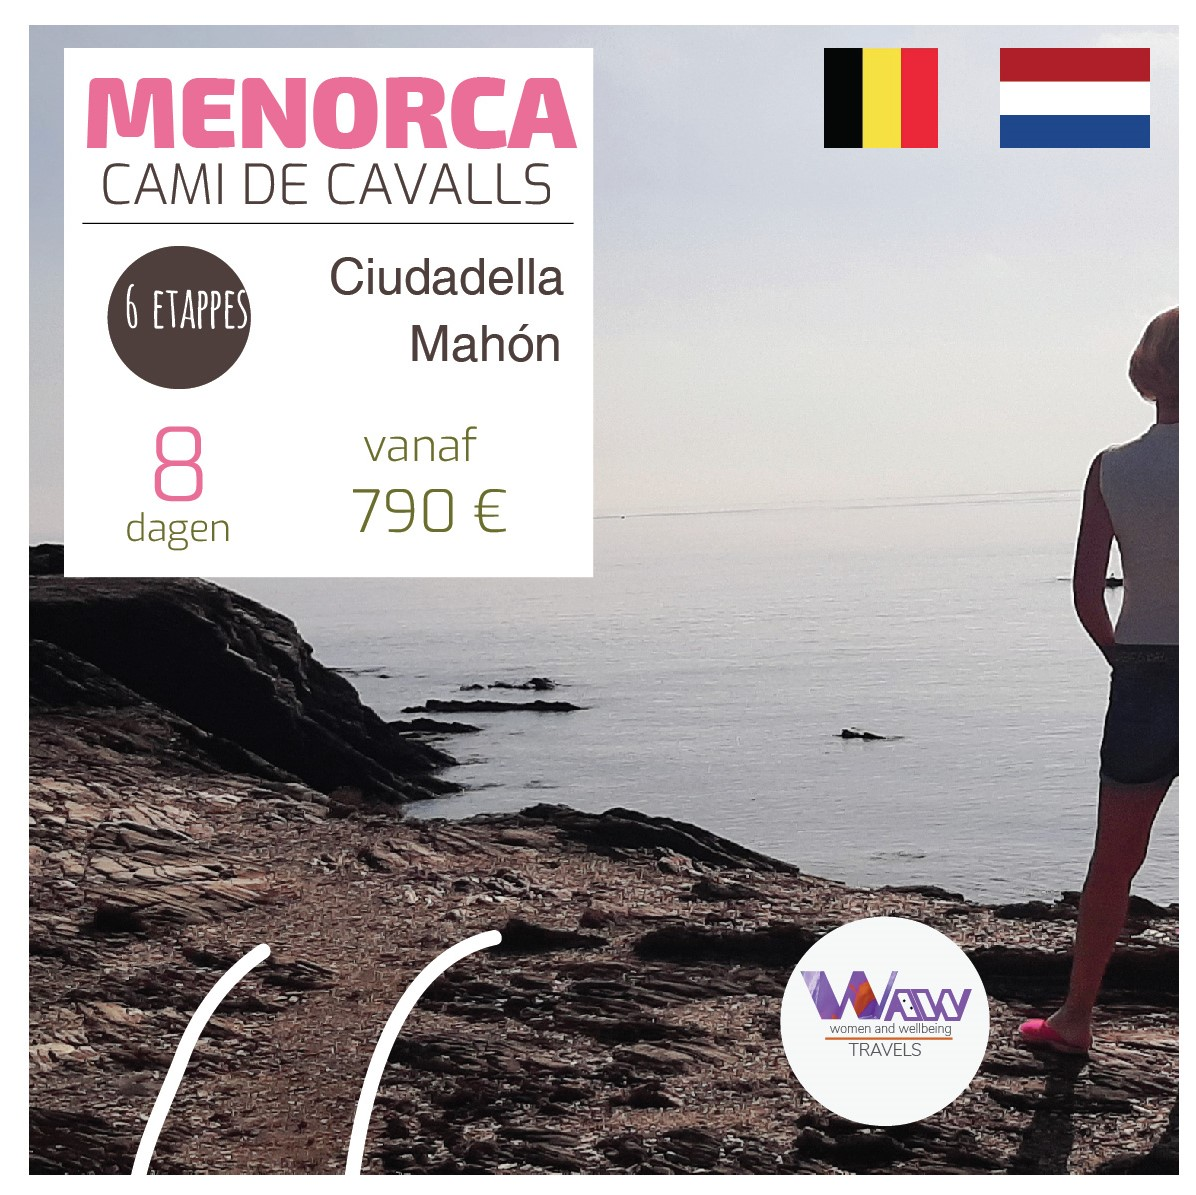 Waw_Travels_isla_Menorca_cami_Cavalls_zuid_6etappes